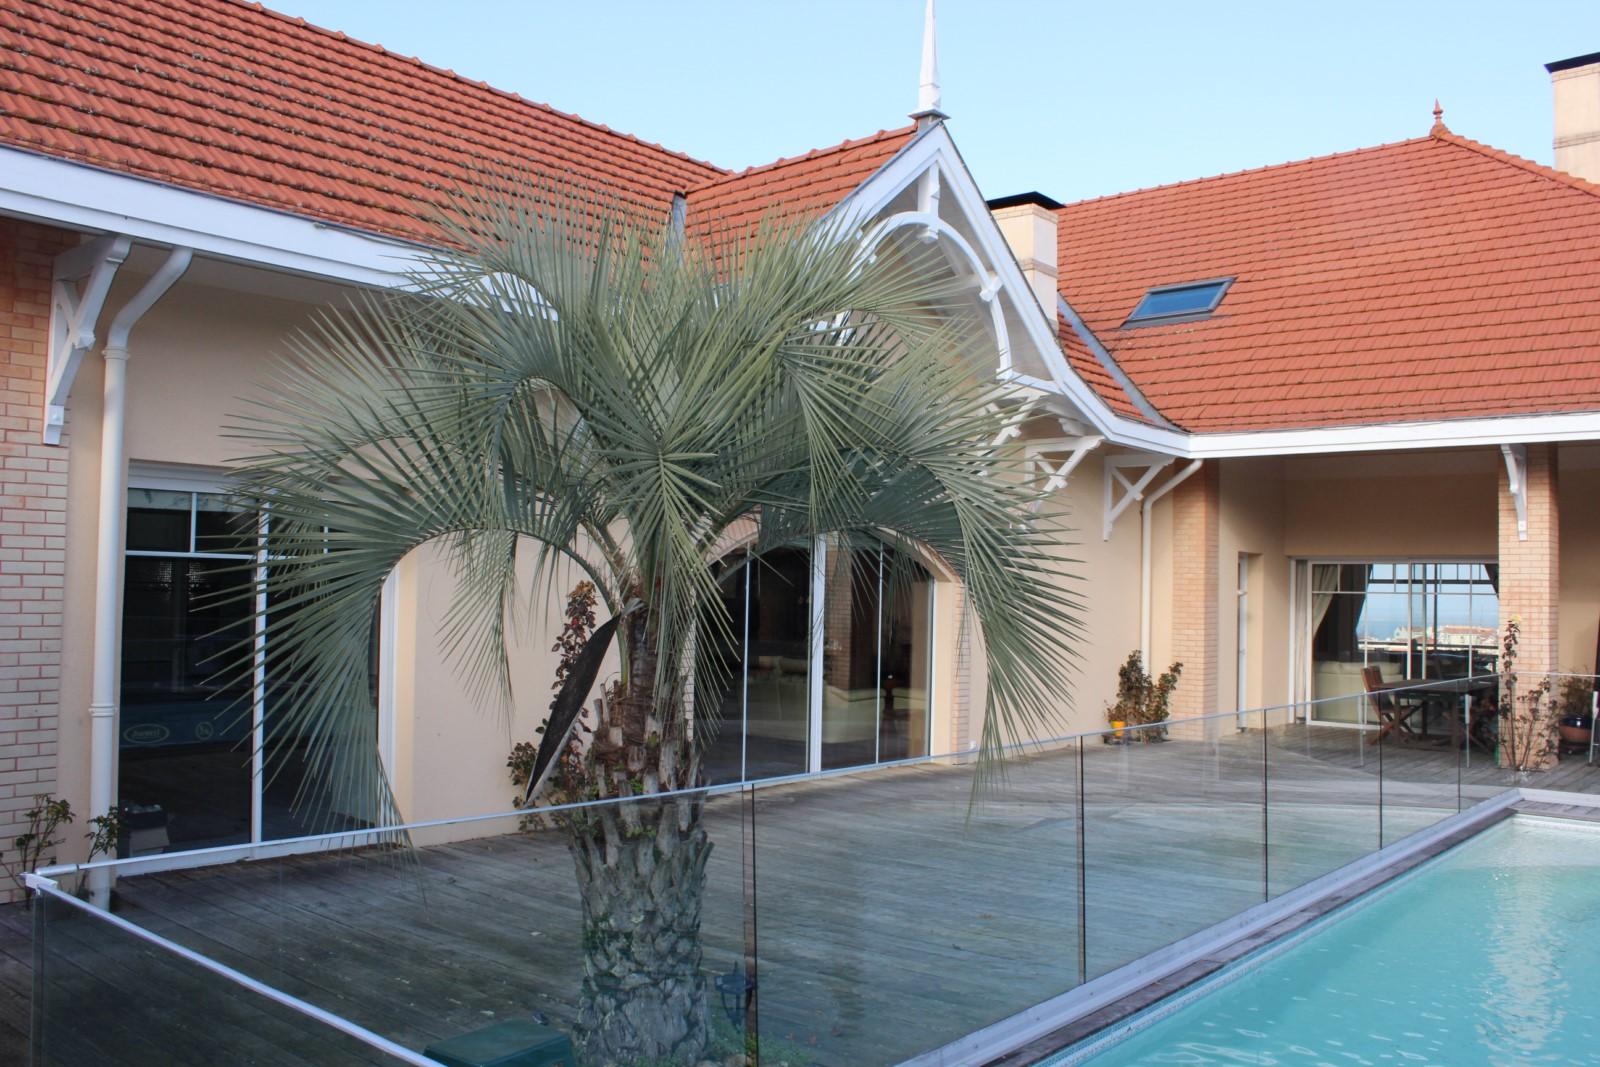 biens immobiliers de luxe avec piscine Bassin Arcachon